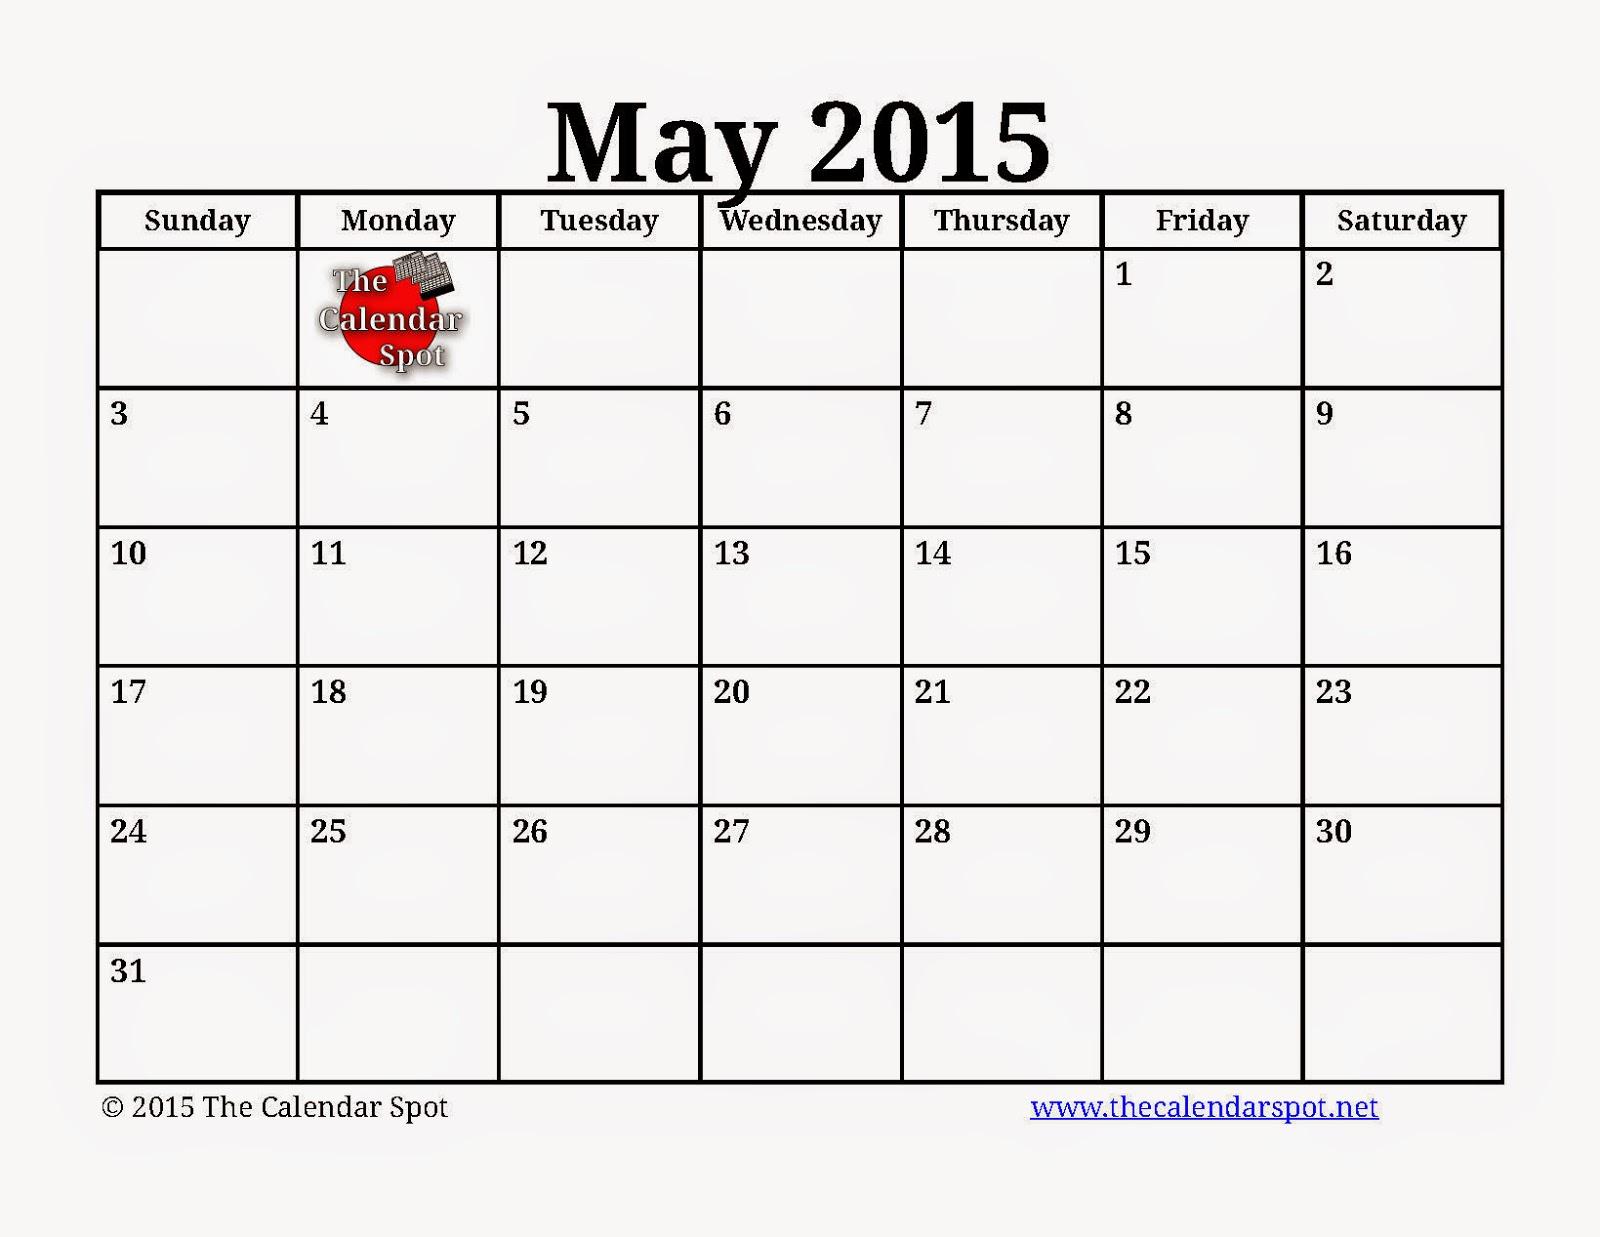 Calendar May Printable : Free printable calendar may